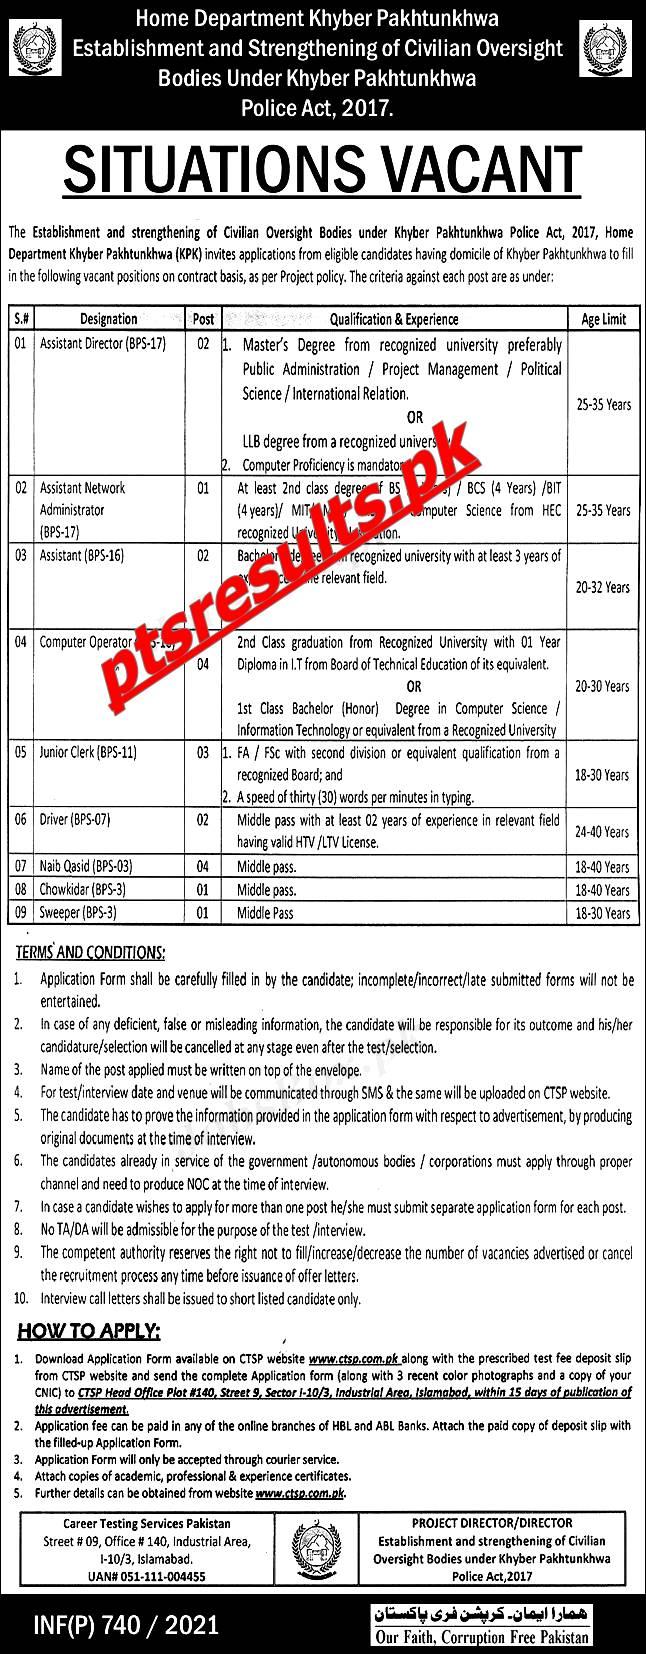 Home Department KPK Jobs 2021 CTSP Application Form Roll No Slip Download Online